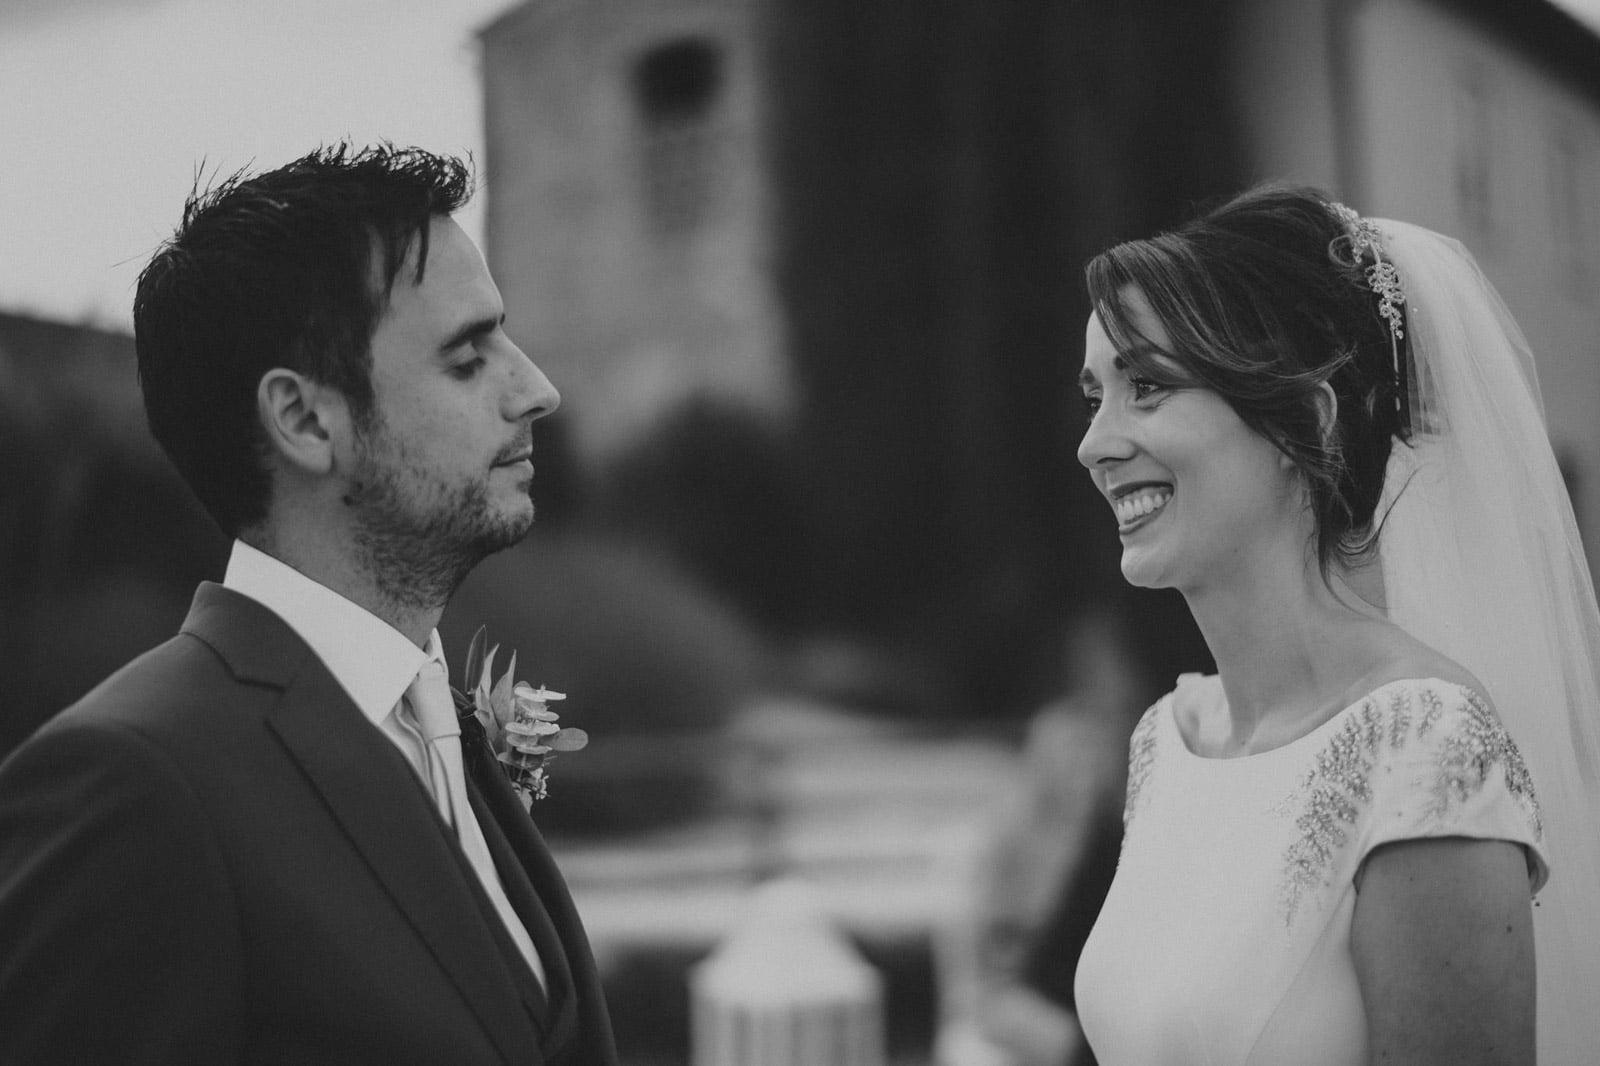 060-wedding-tuscany-san-galgano-federico-pannacci-photographer